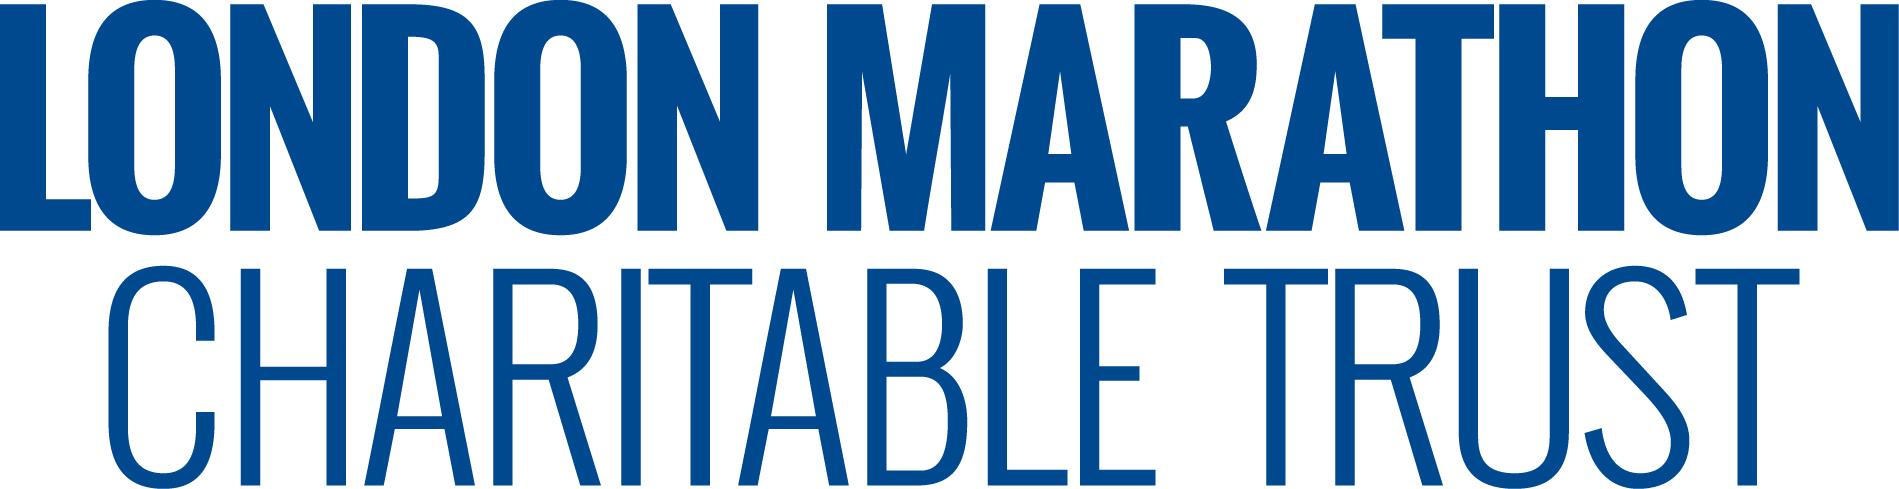 london marathon charitable trust blue logo